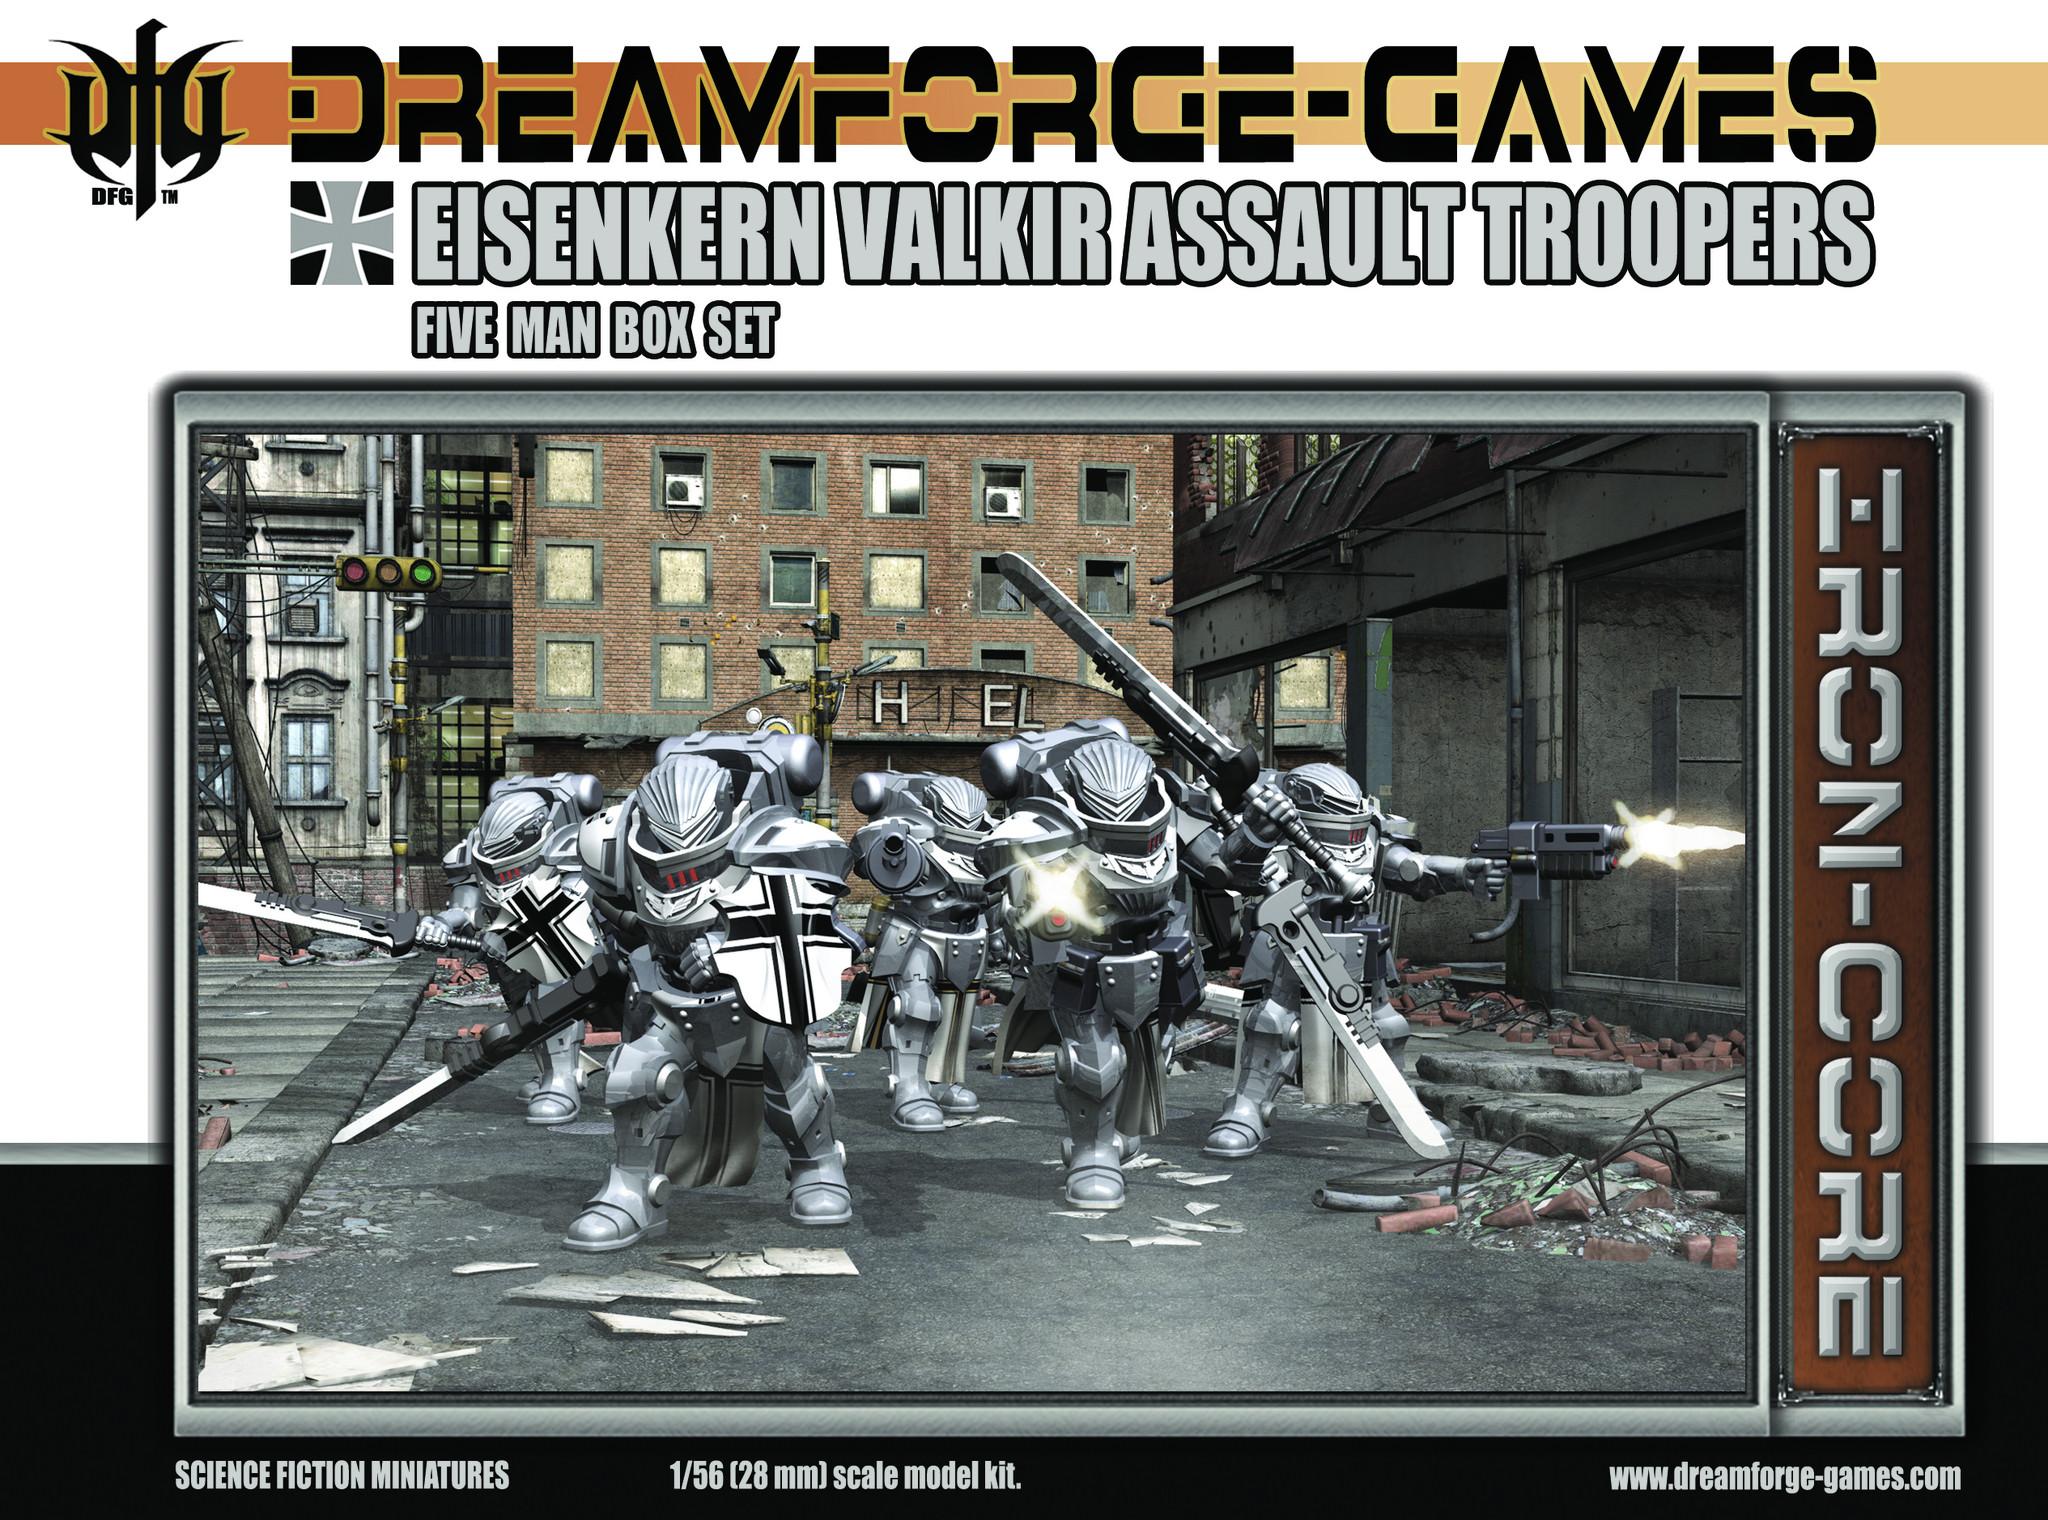 Eisenkern_Valkir_Assault_Troopers_box_front-2